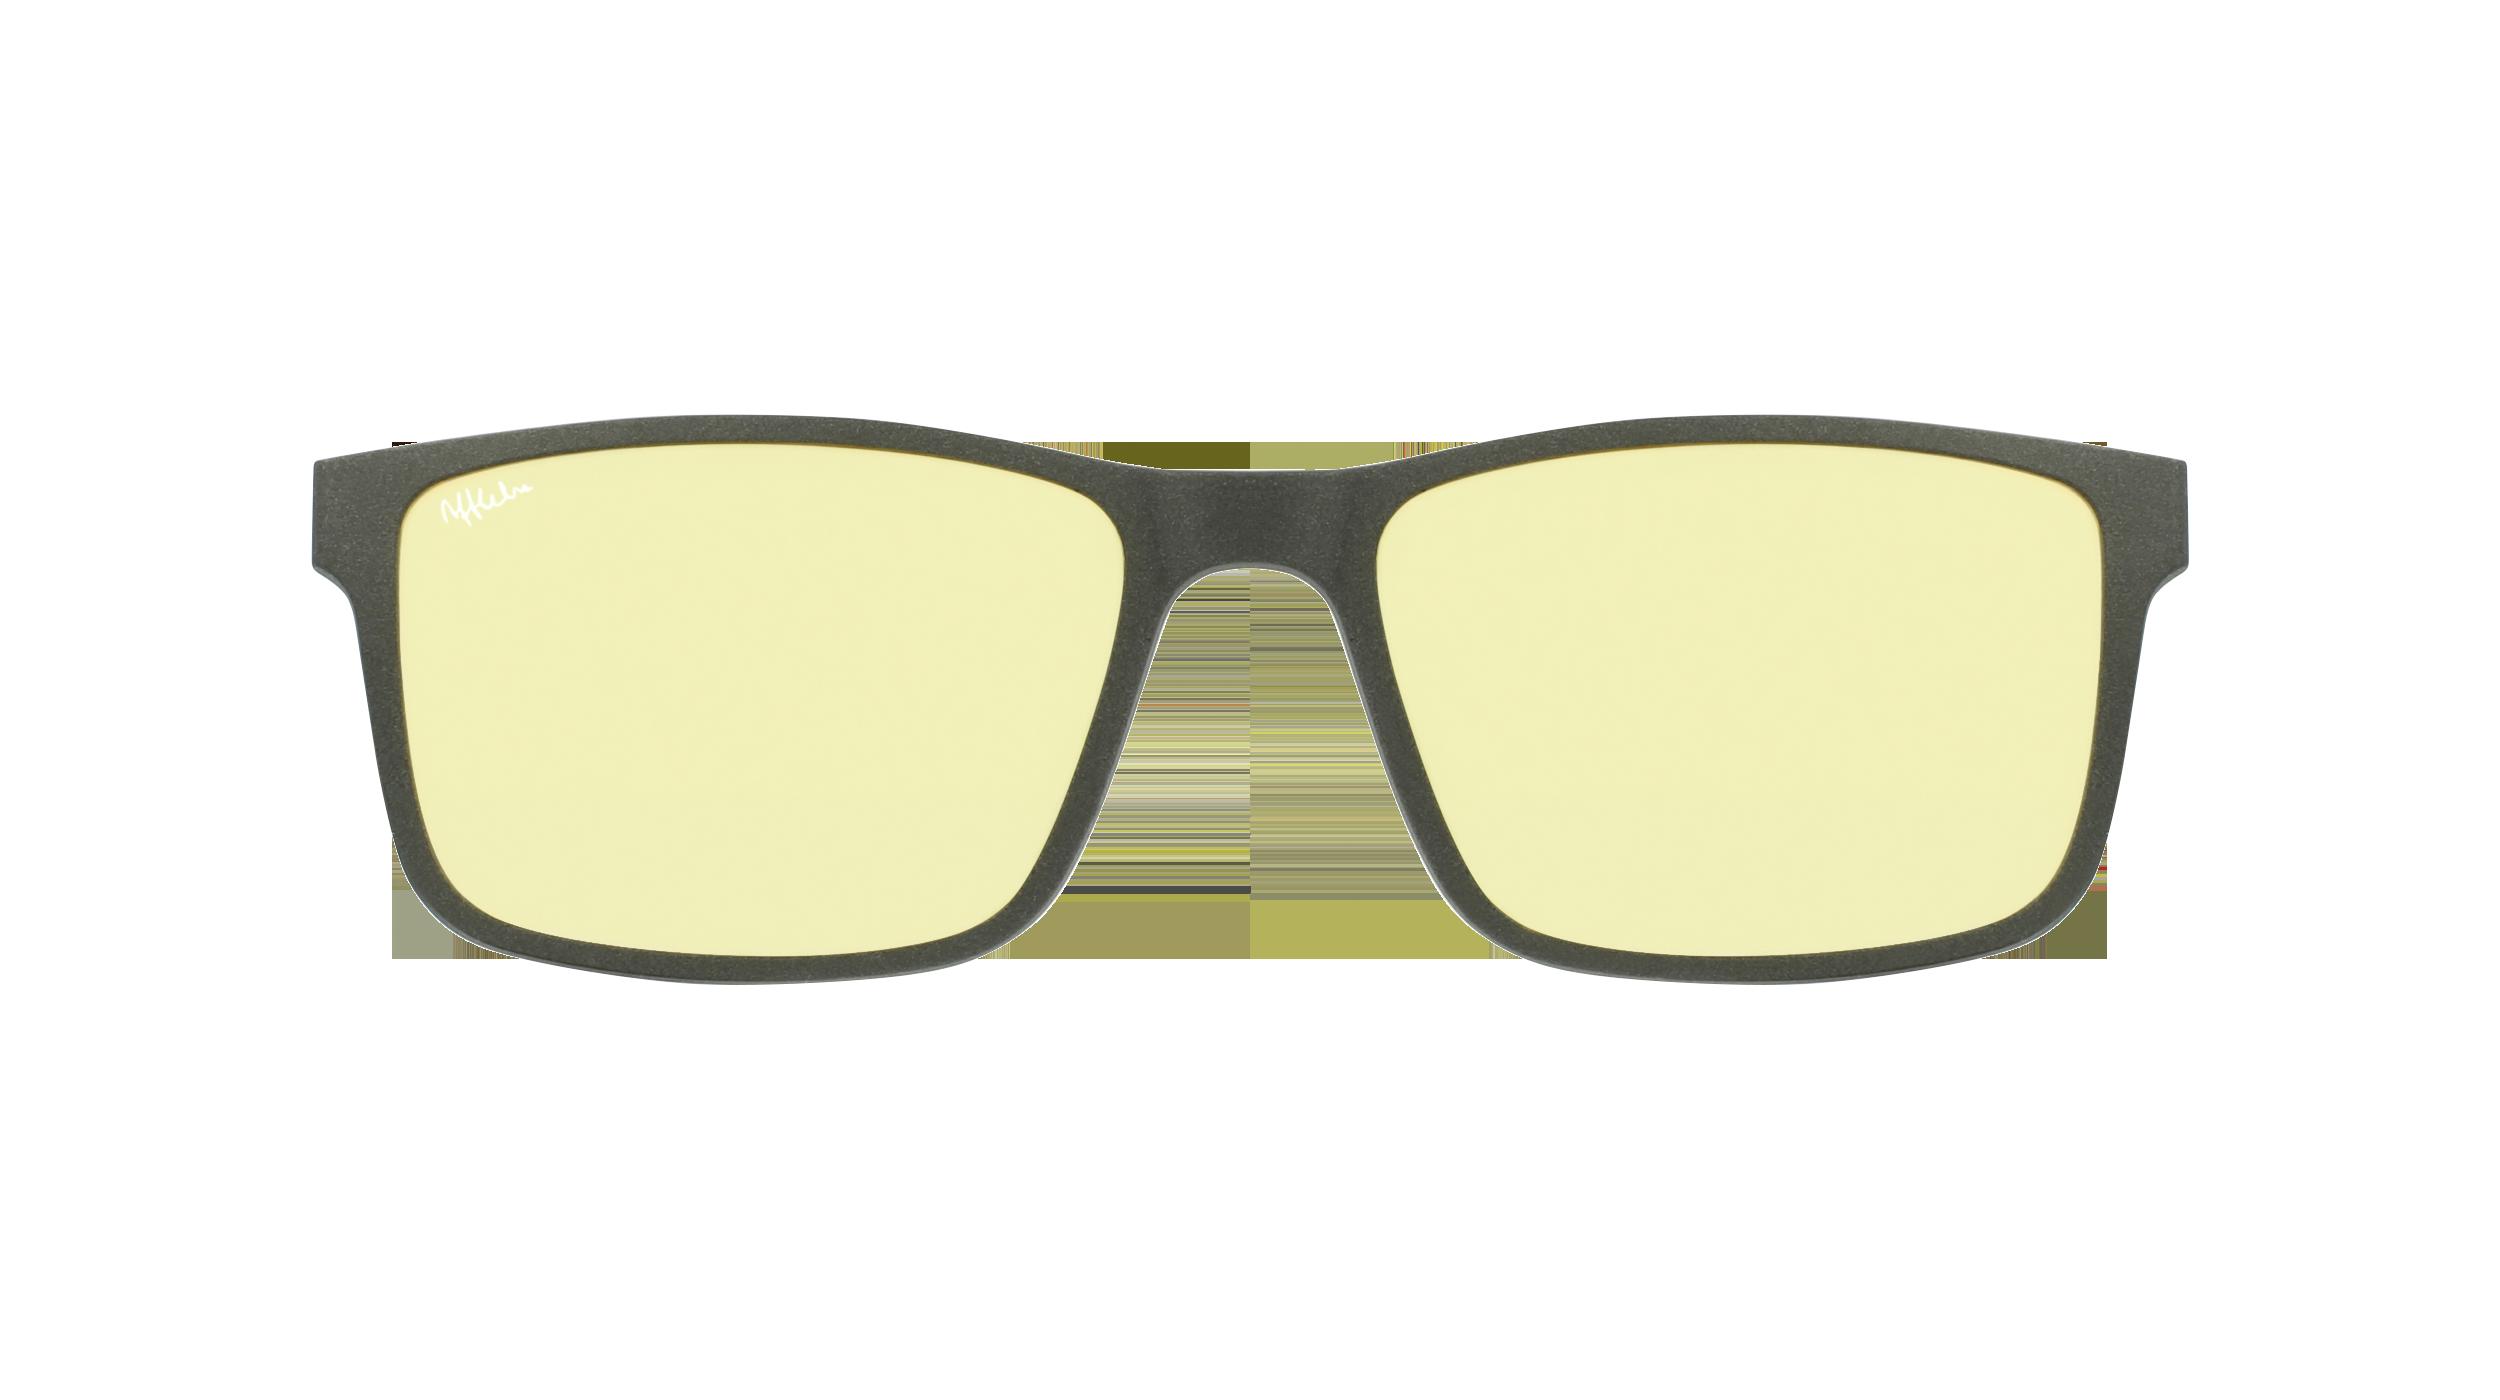 afflelou/france/products/smart_clip/clips_glasses/07630036457481.png